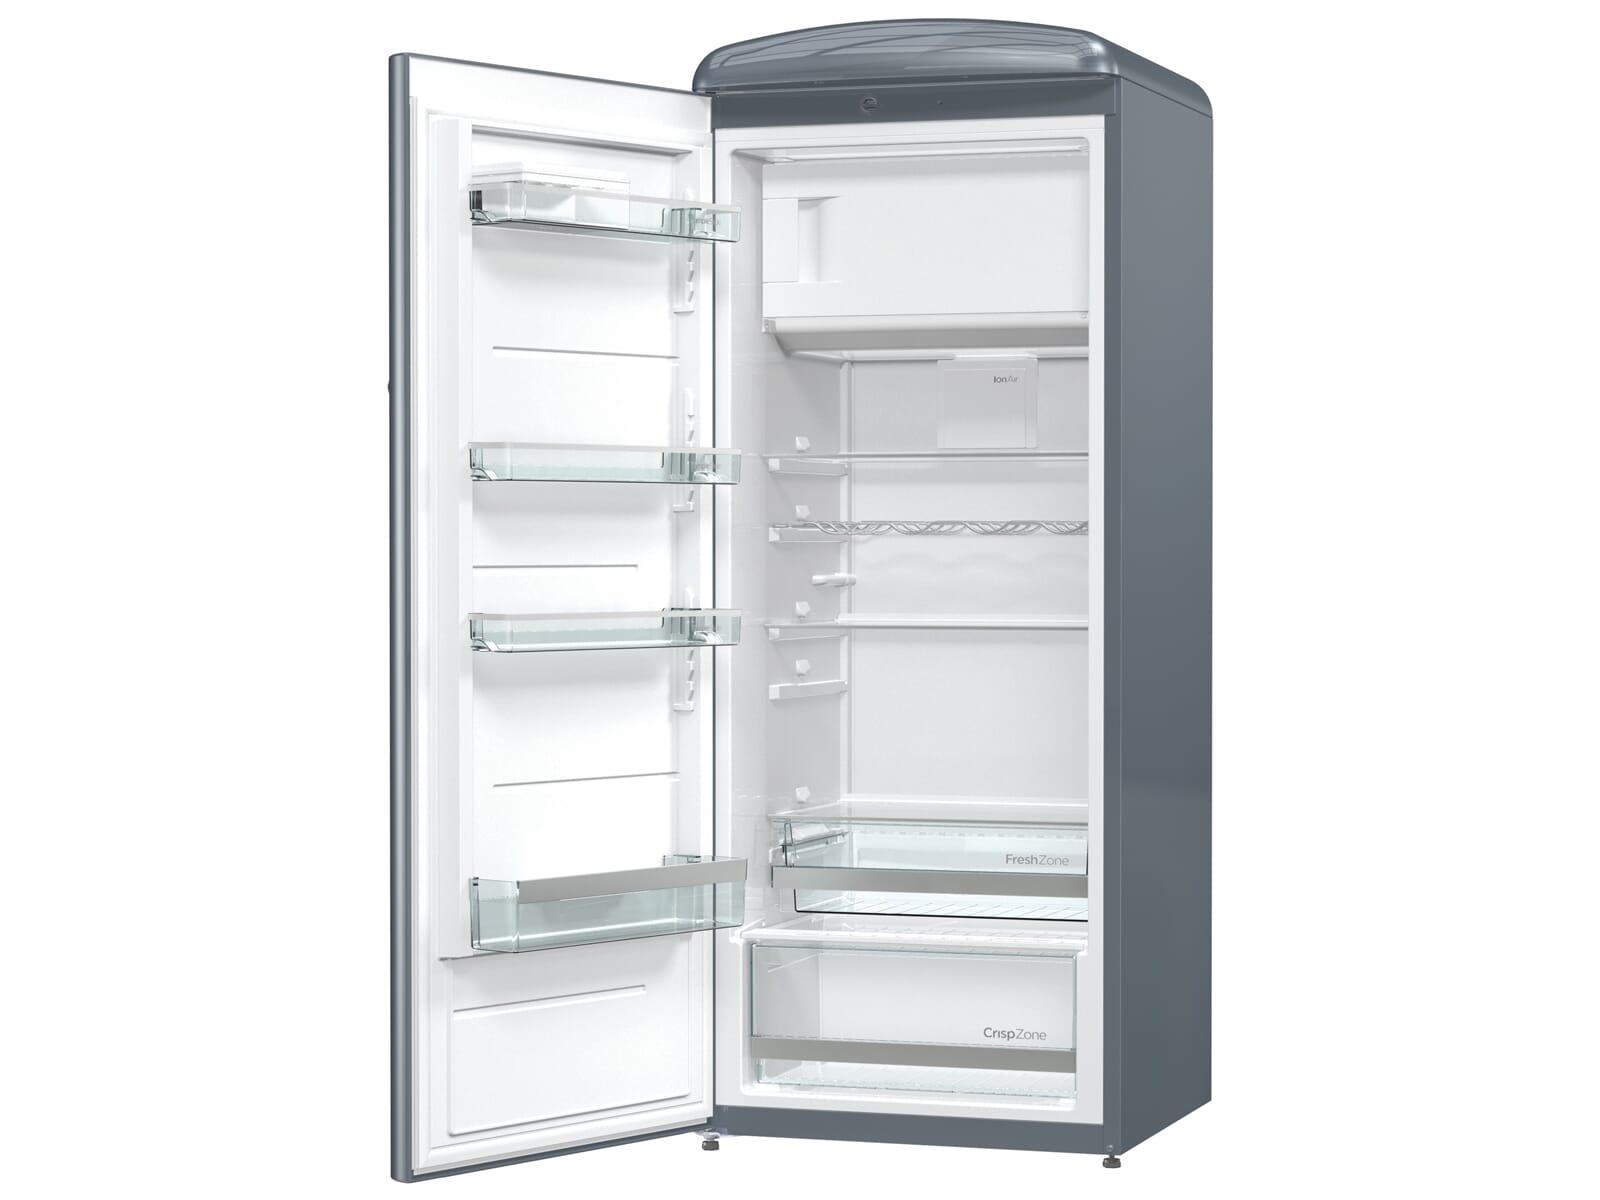 Kühlschrank Xl : Gorenje orb l standkühlschrank grau metallic